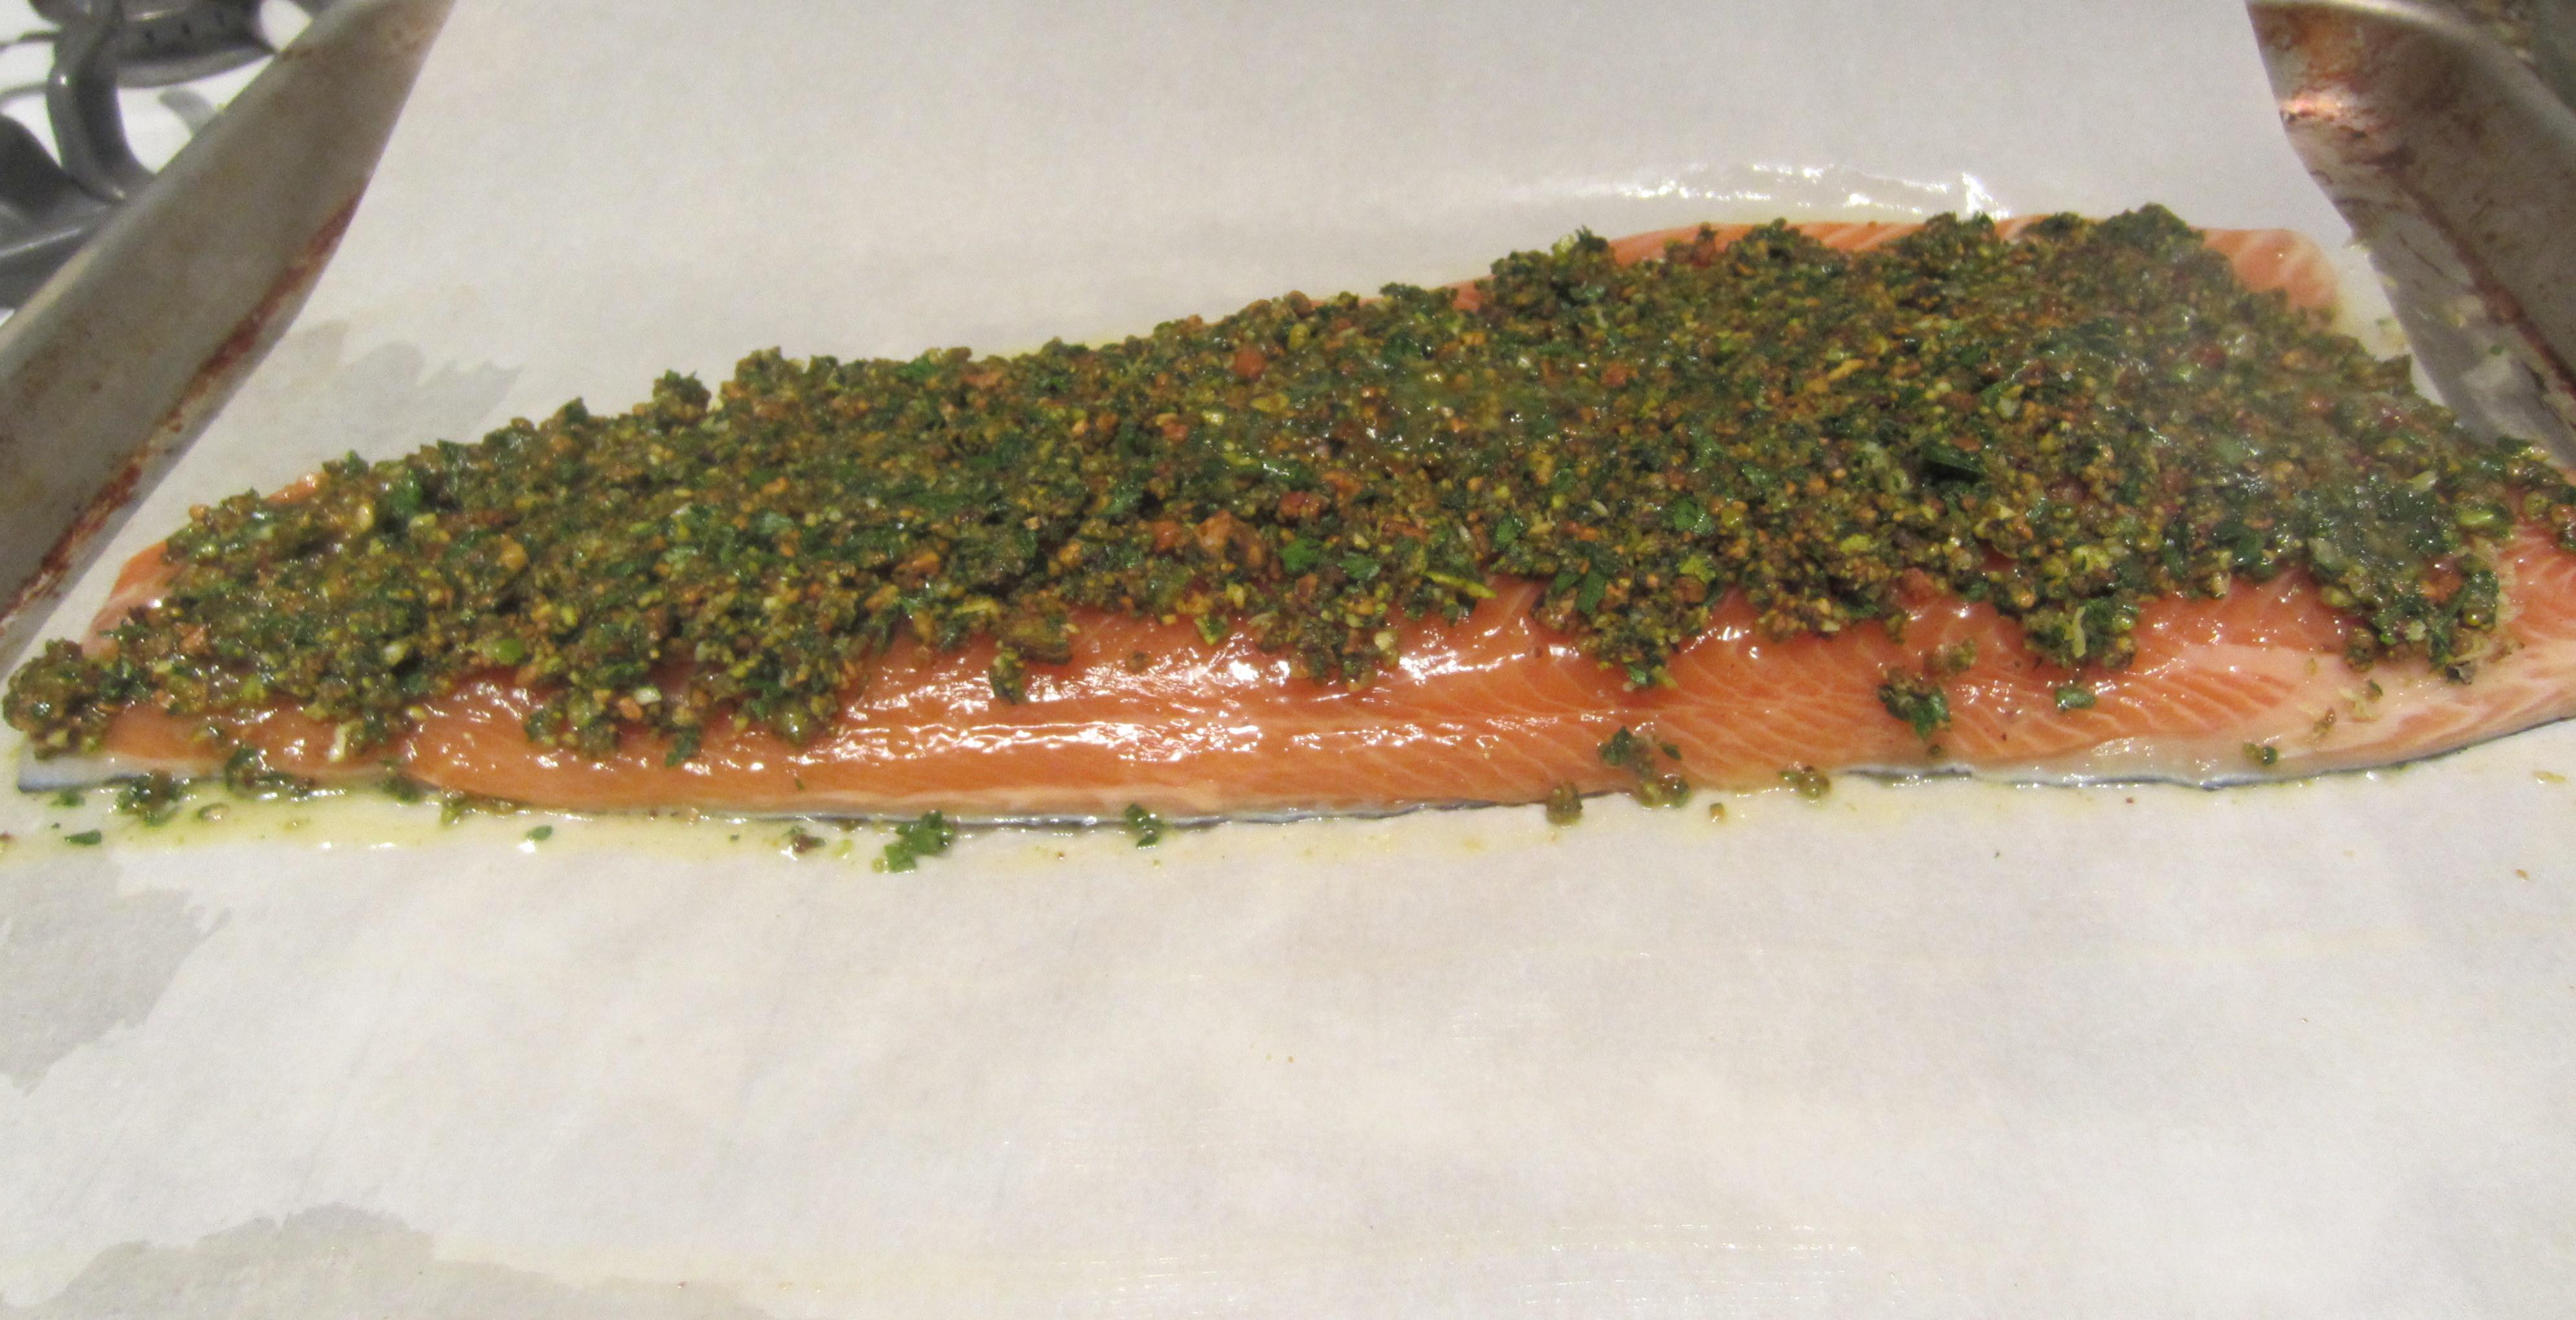 Pistachio-Crusted Salmon